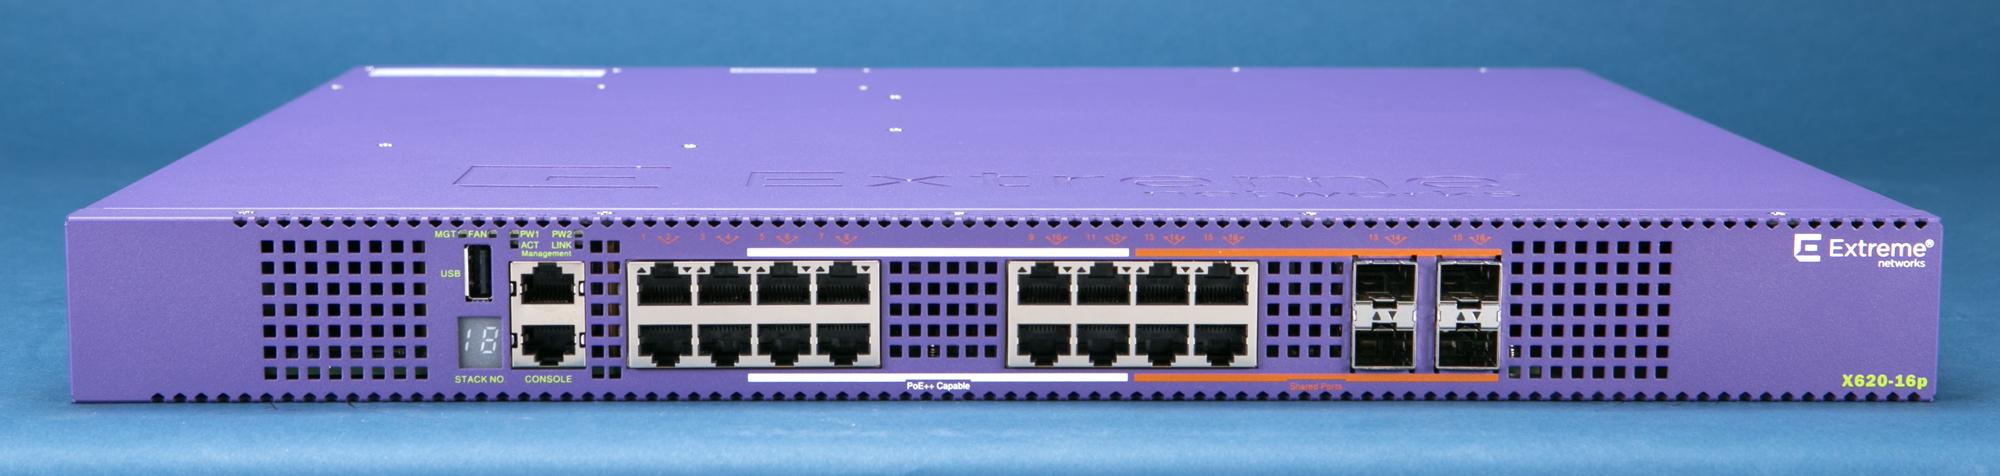 ExtremeSwitching™ X620-16p